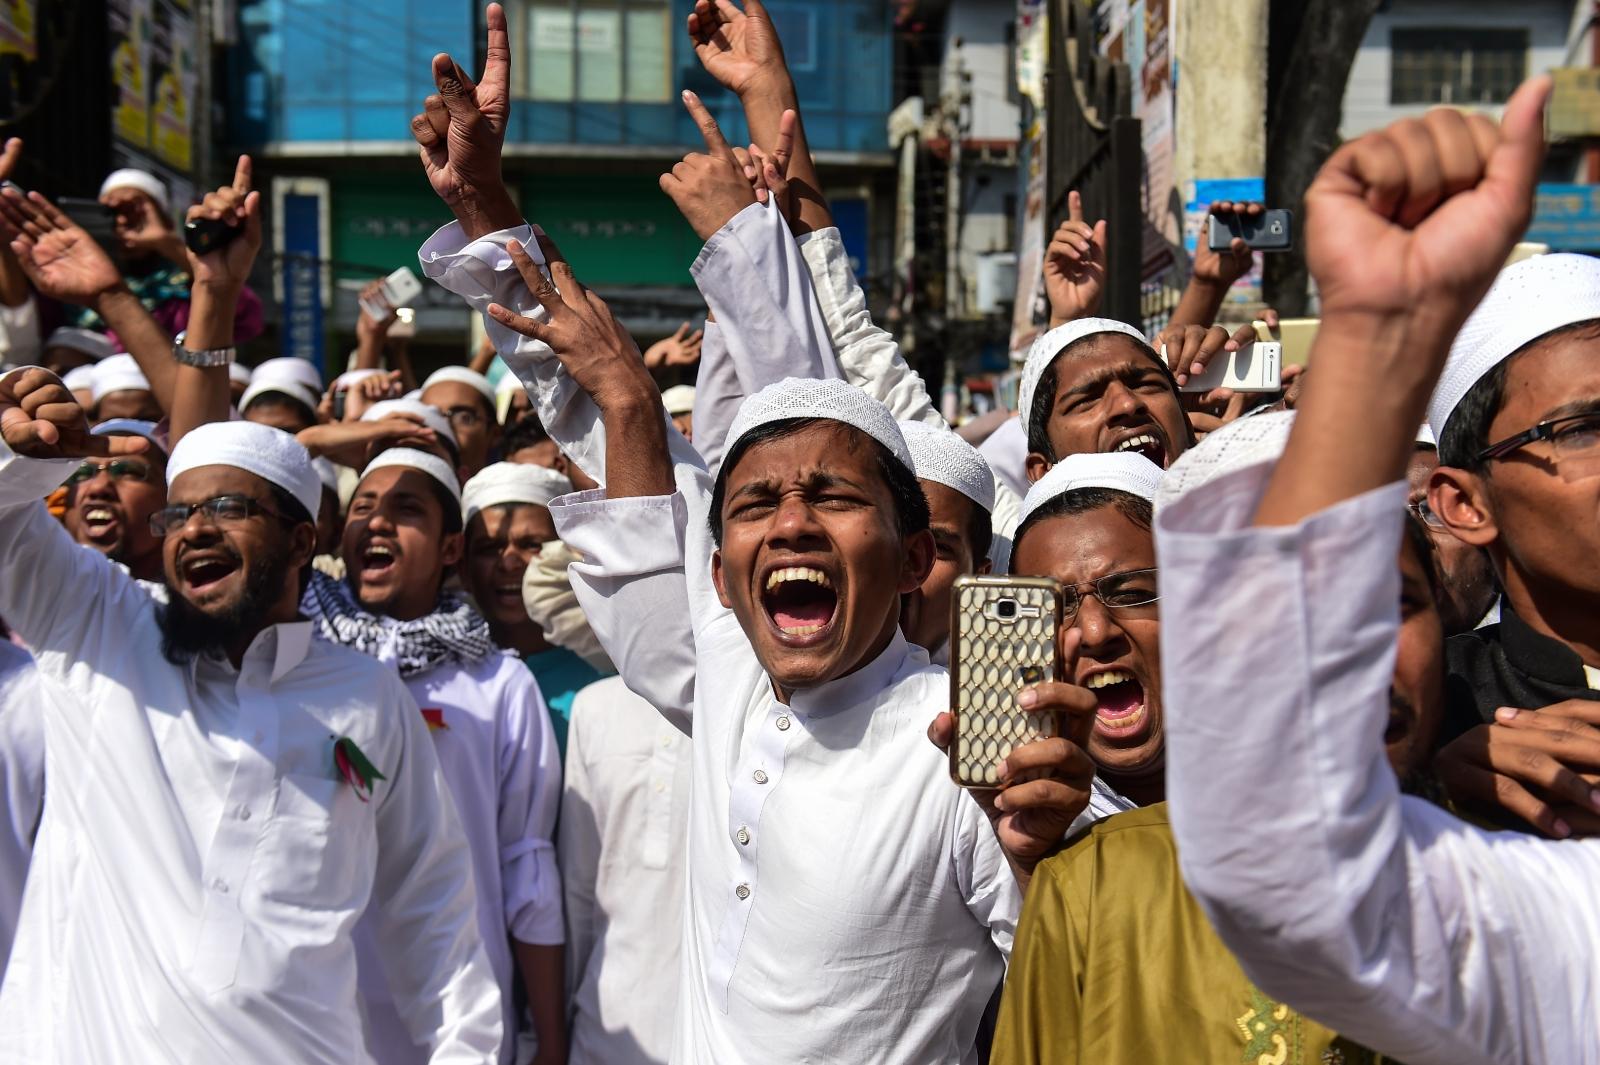 BANGLADESH-UNREST-ISLAM-POLITICS